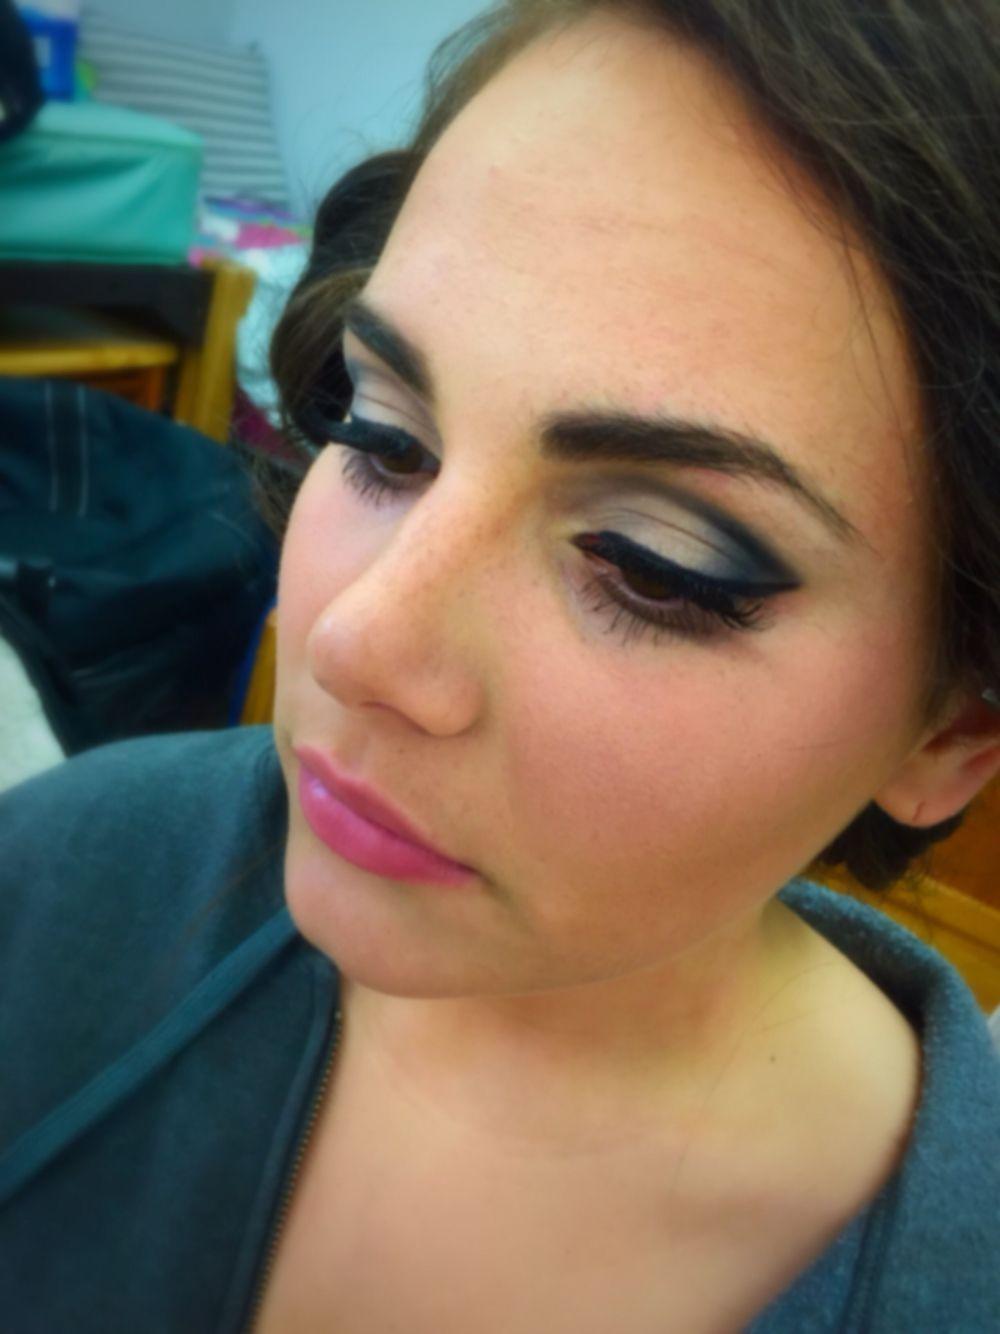 Extreme nose piercing  Comencement Ball makeup eyeshadow eyelashes makeup contour